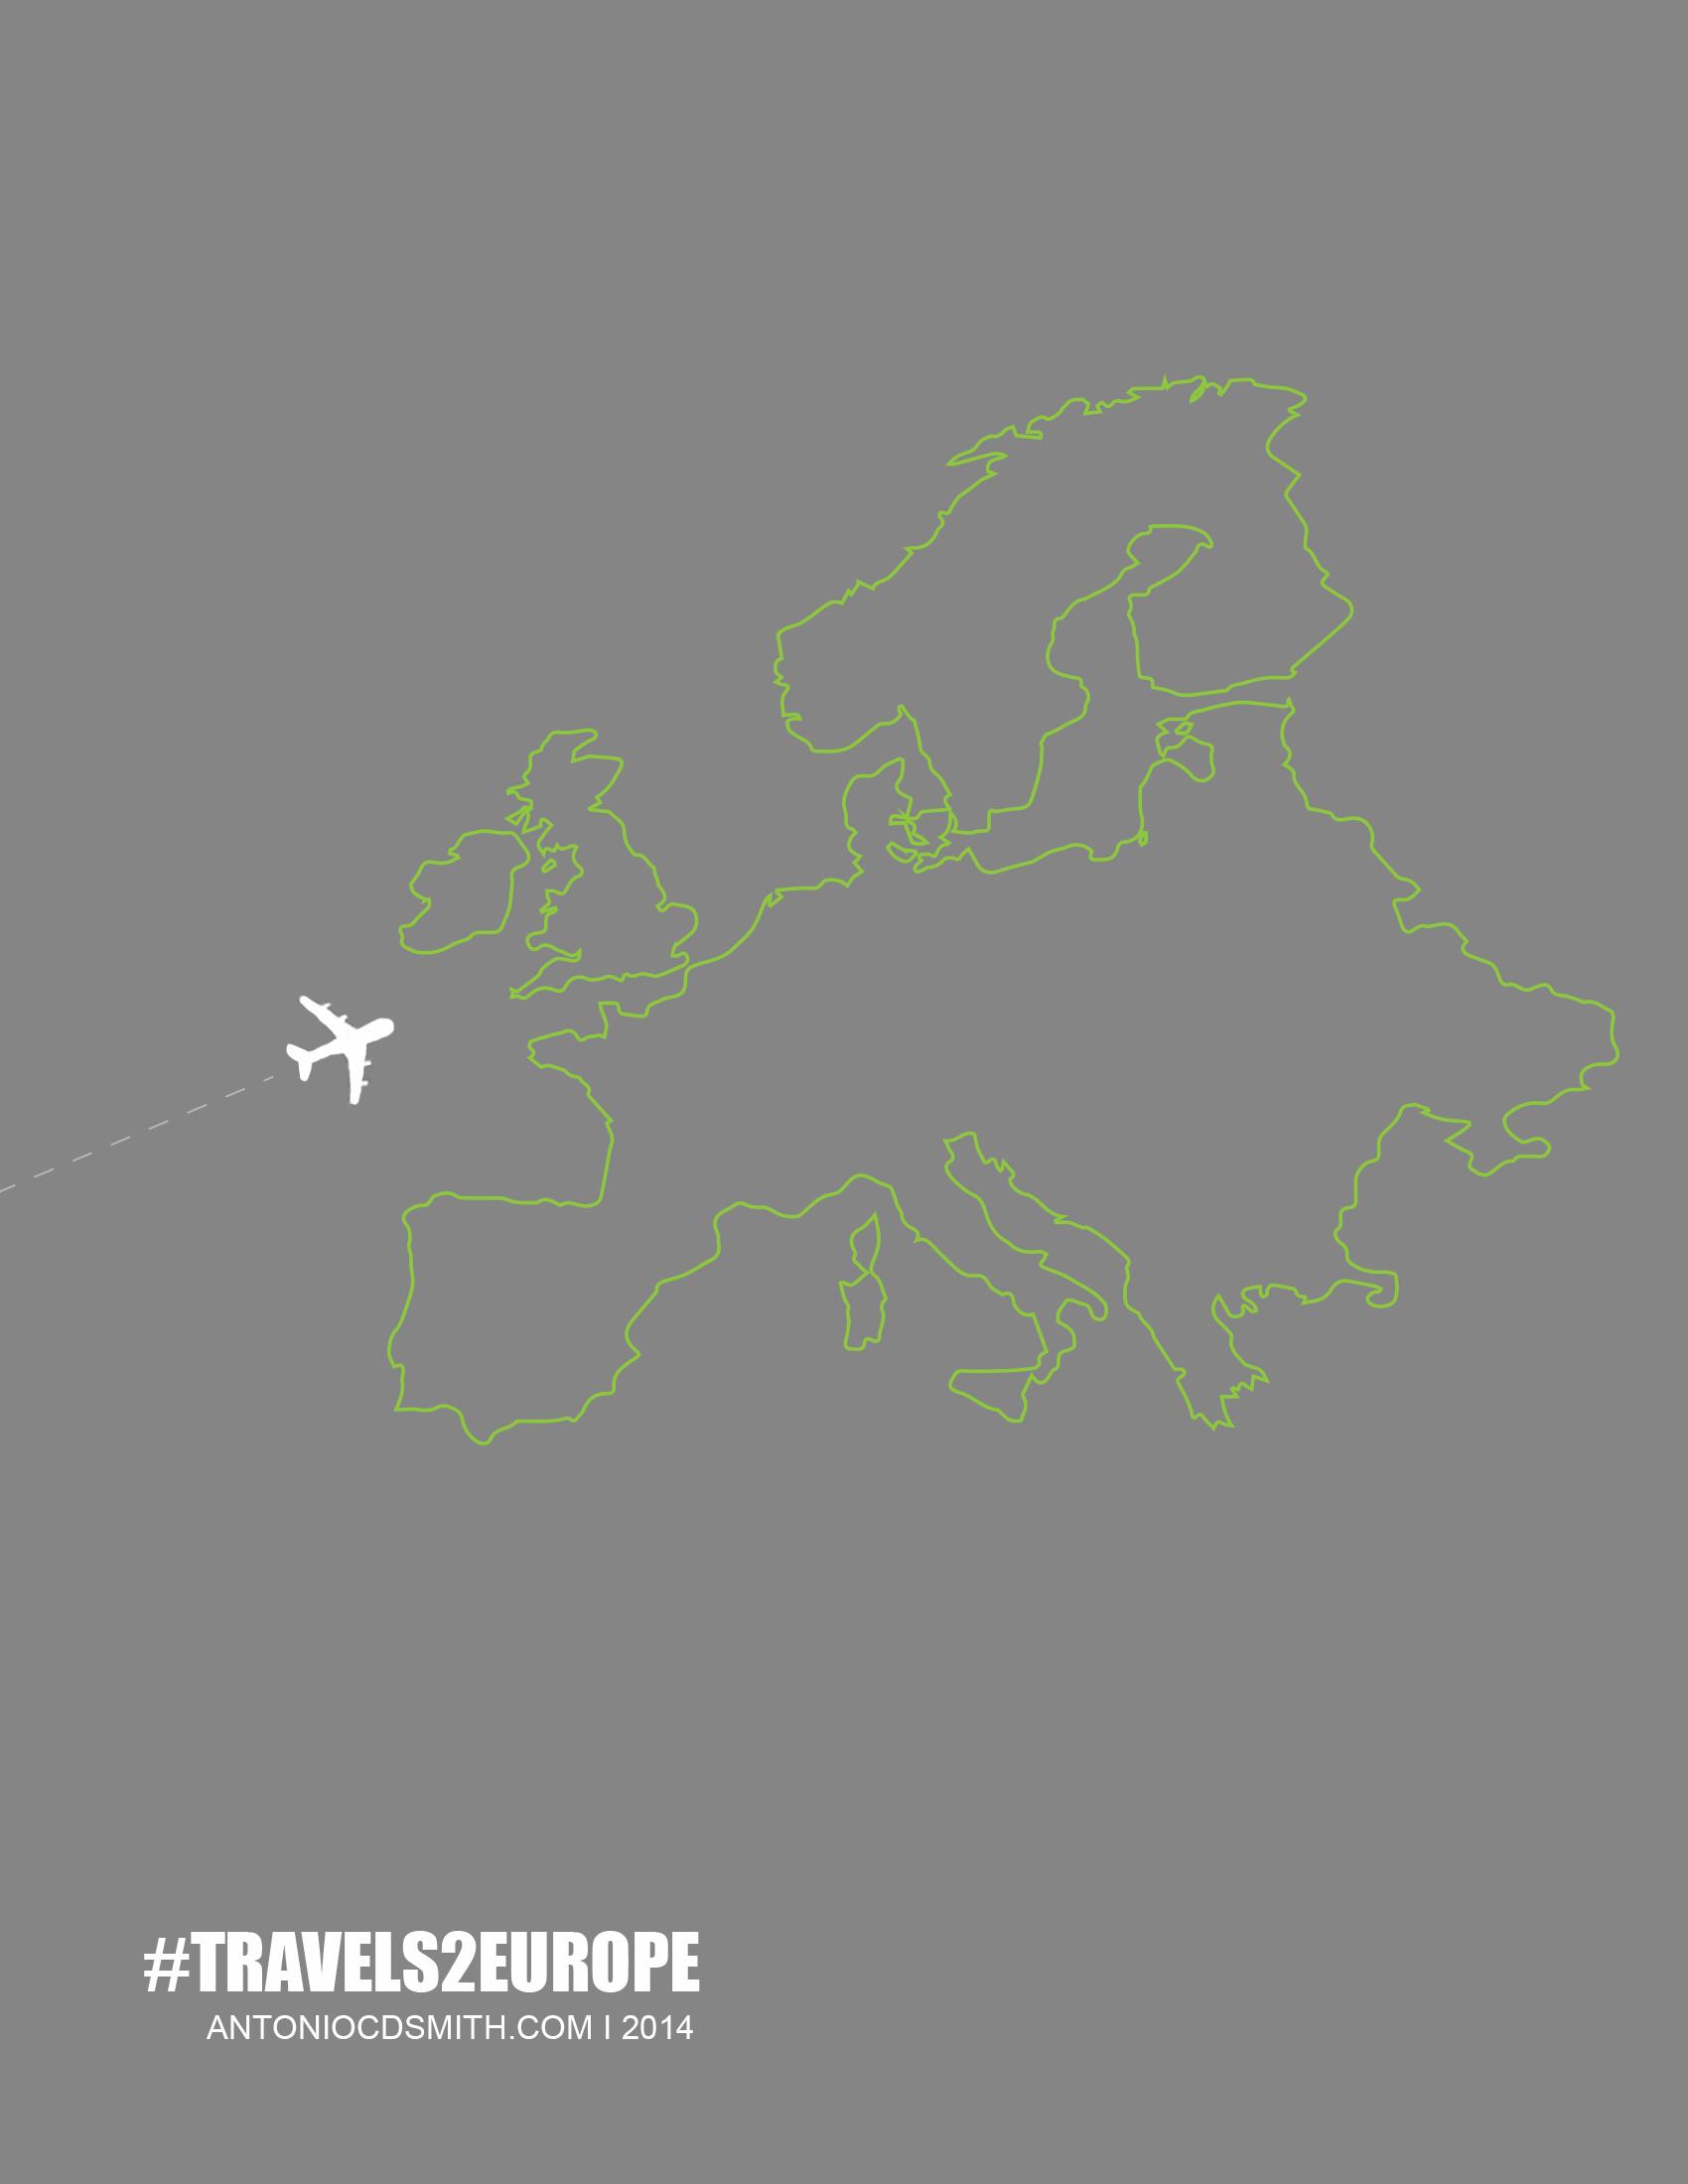 #Travels2Euro